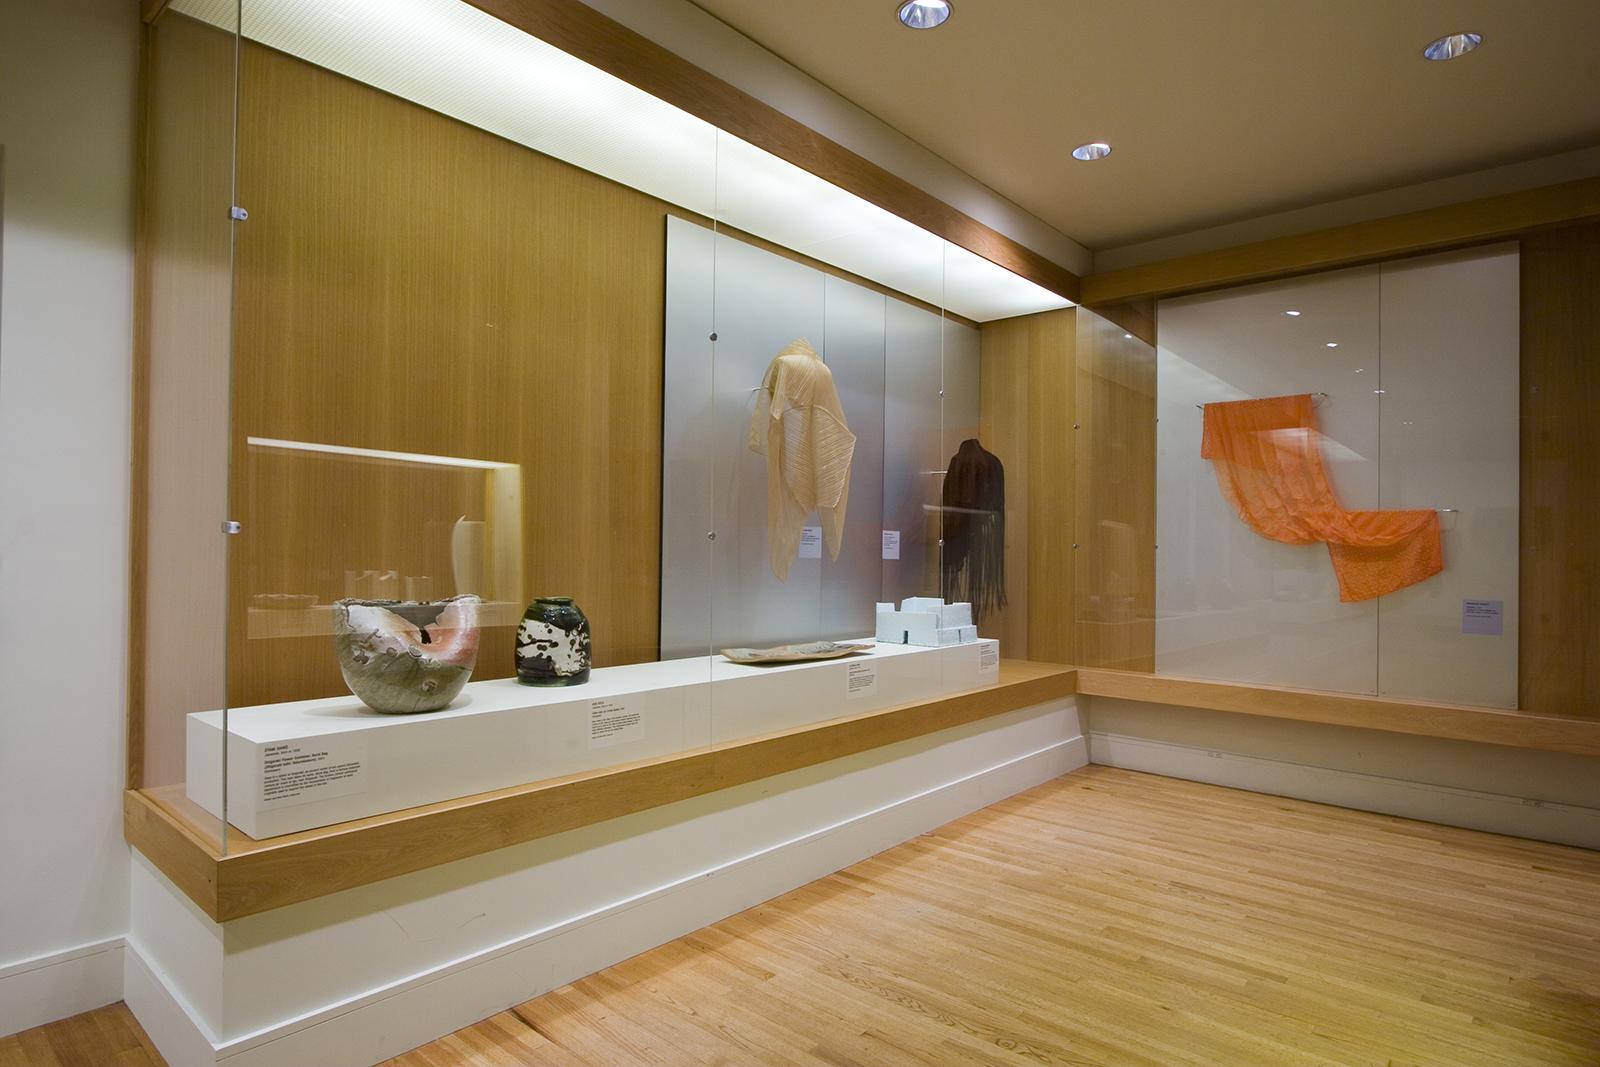 Installation of ceramics and textiles